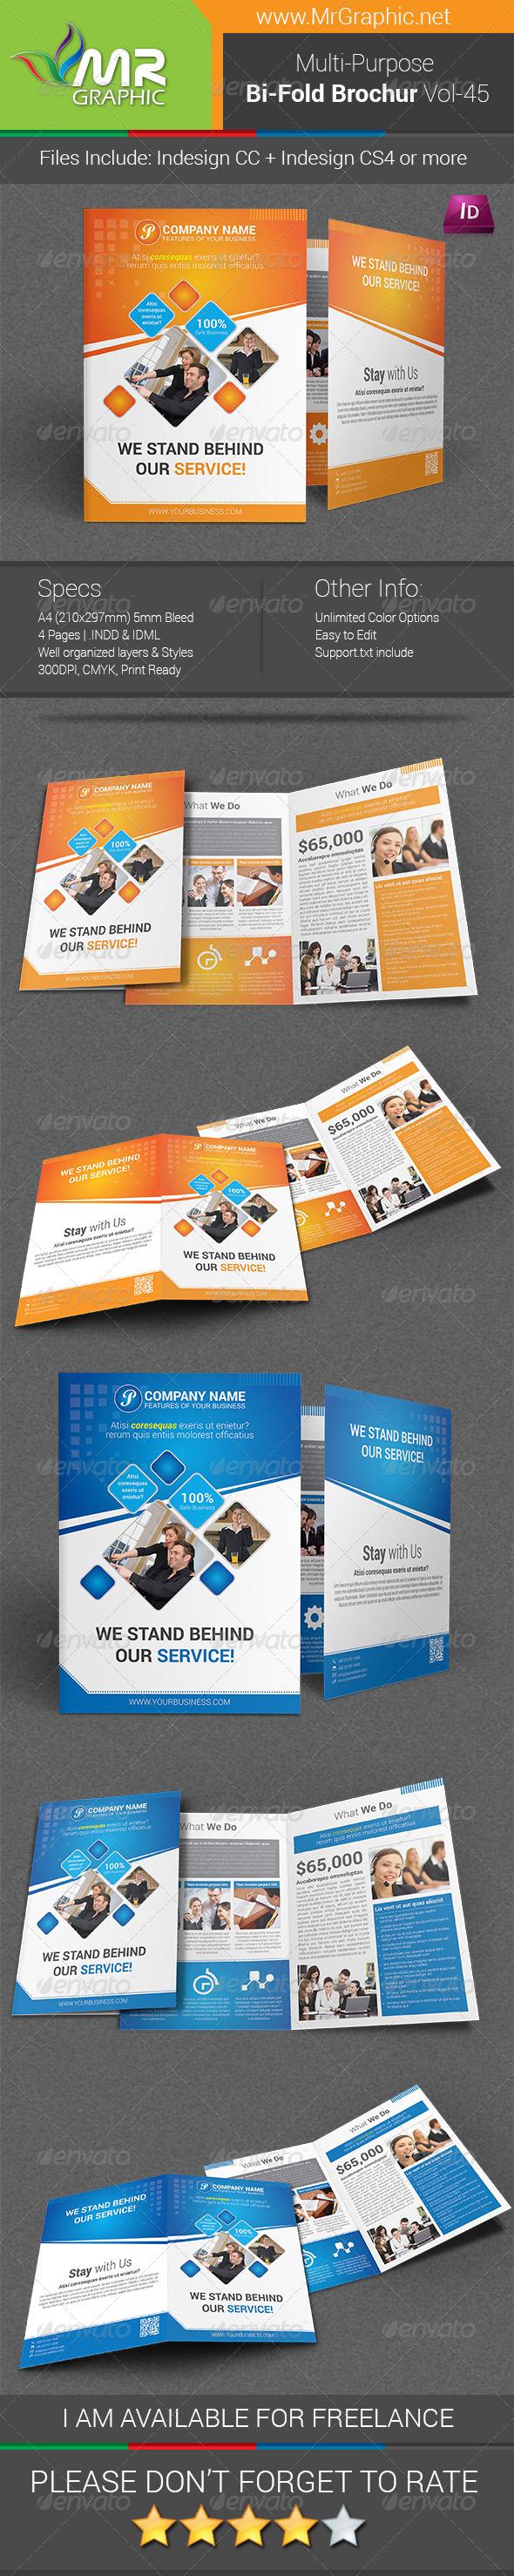 Multipurpose Bifold Brochure Template Vol-45 - Corporate Brochures